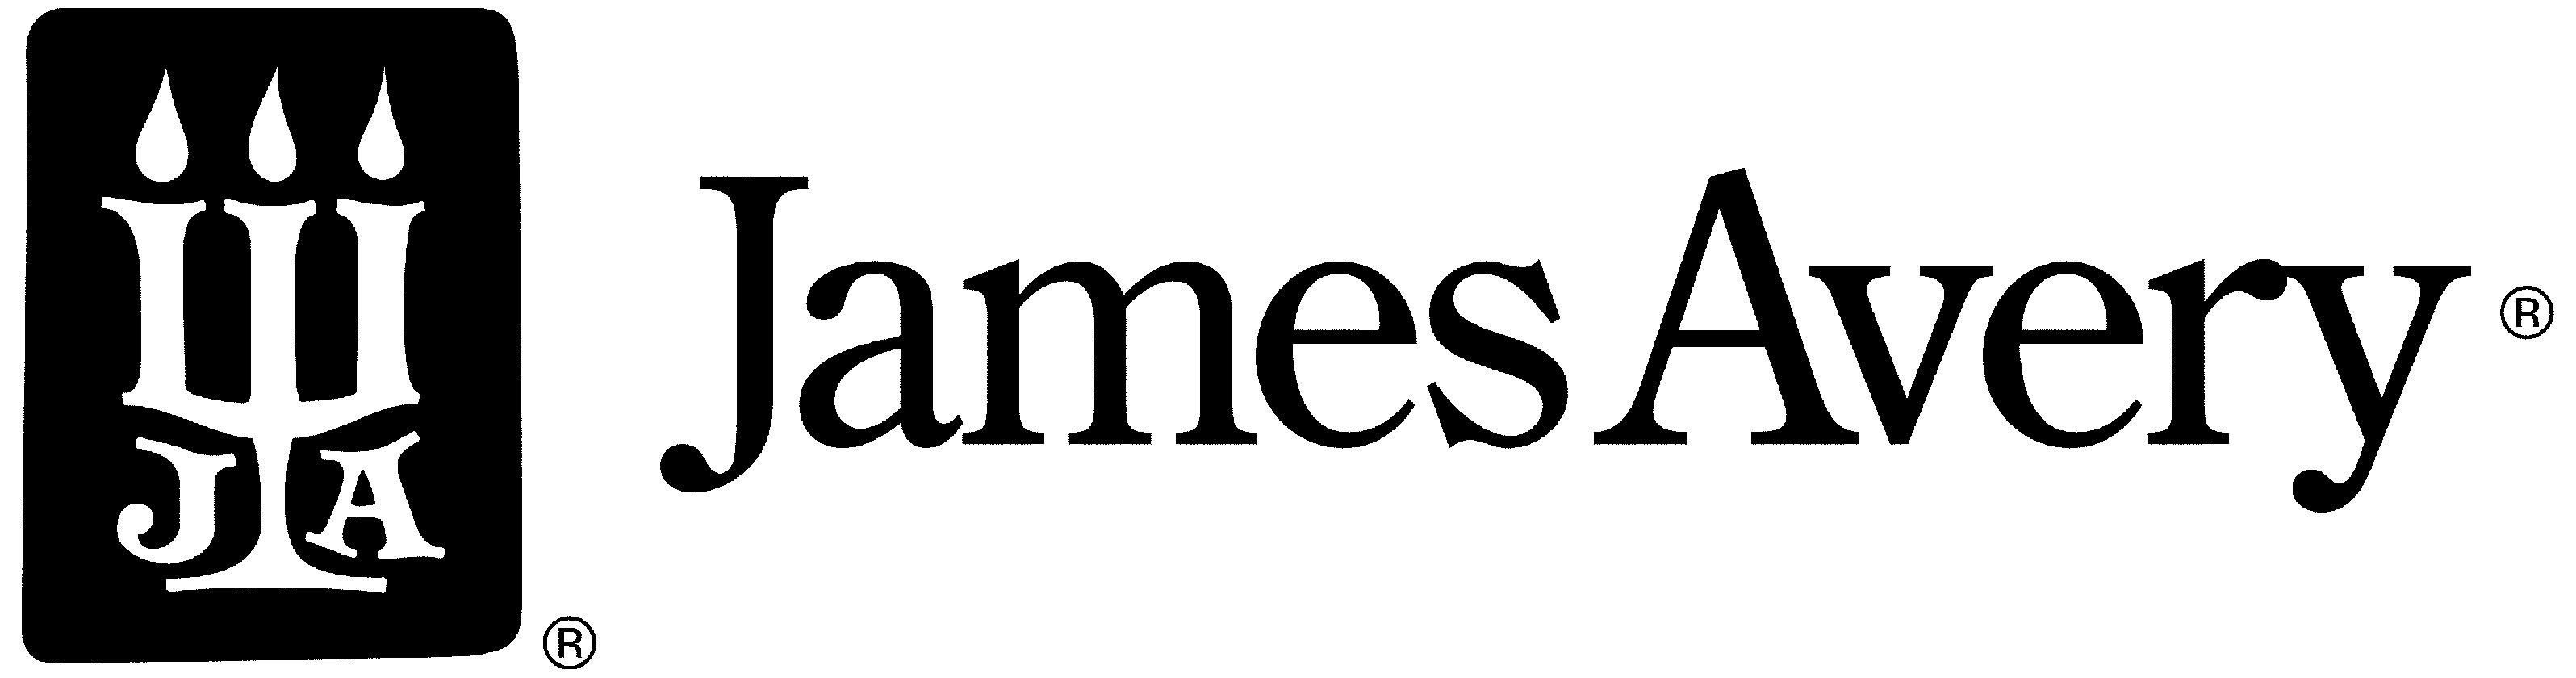 James Avery Jewelry Ce...